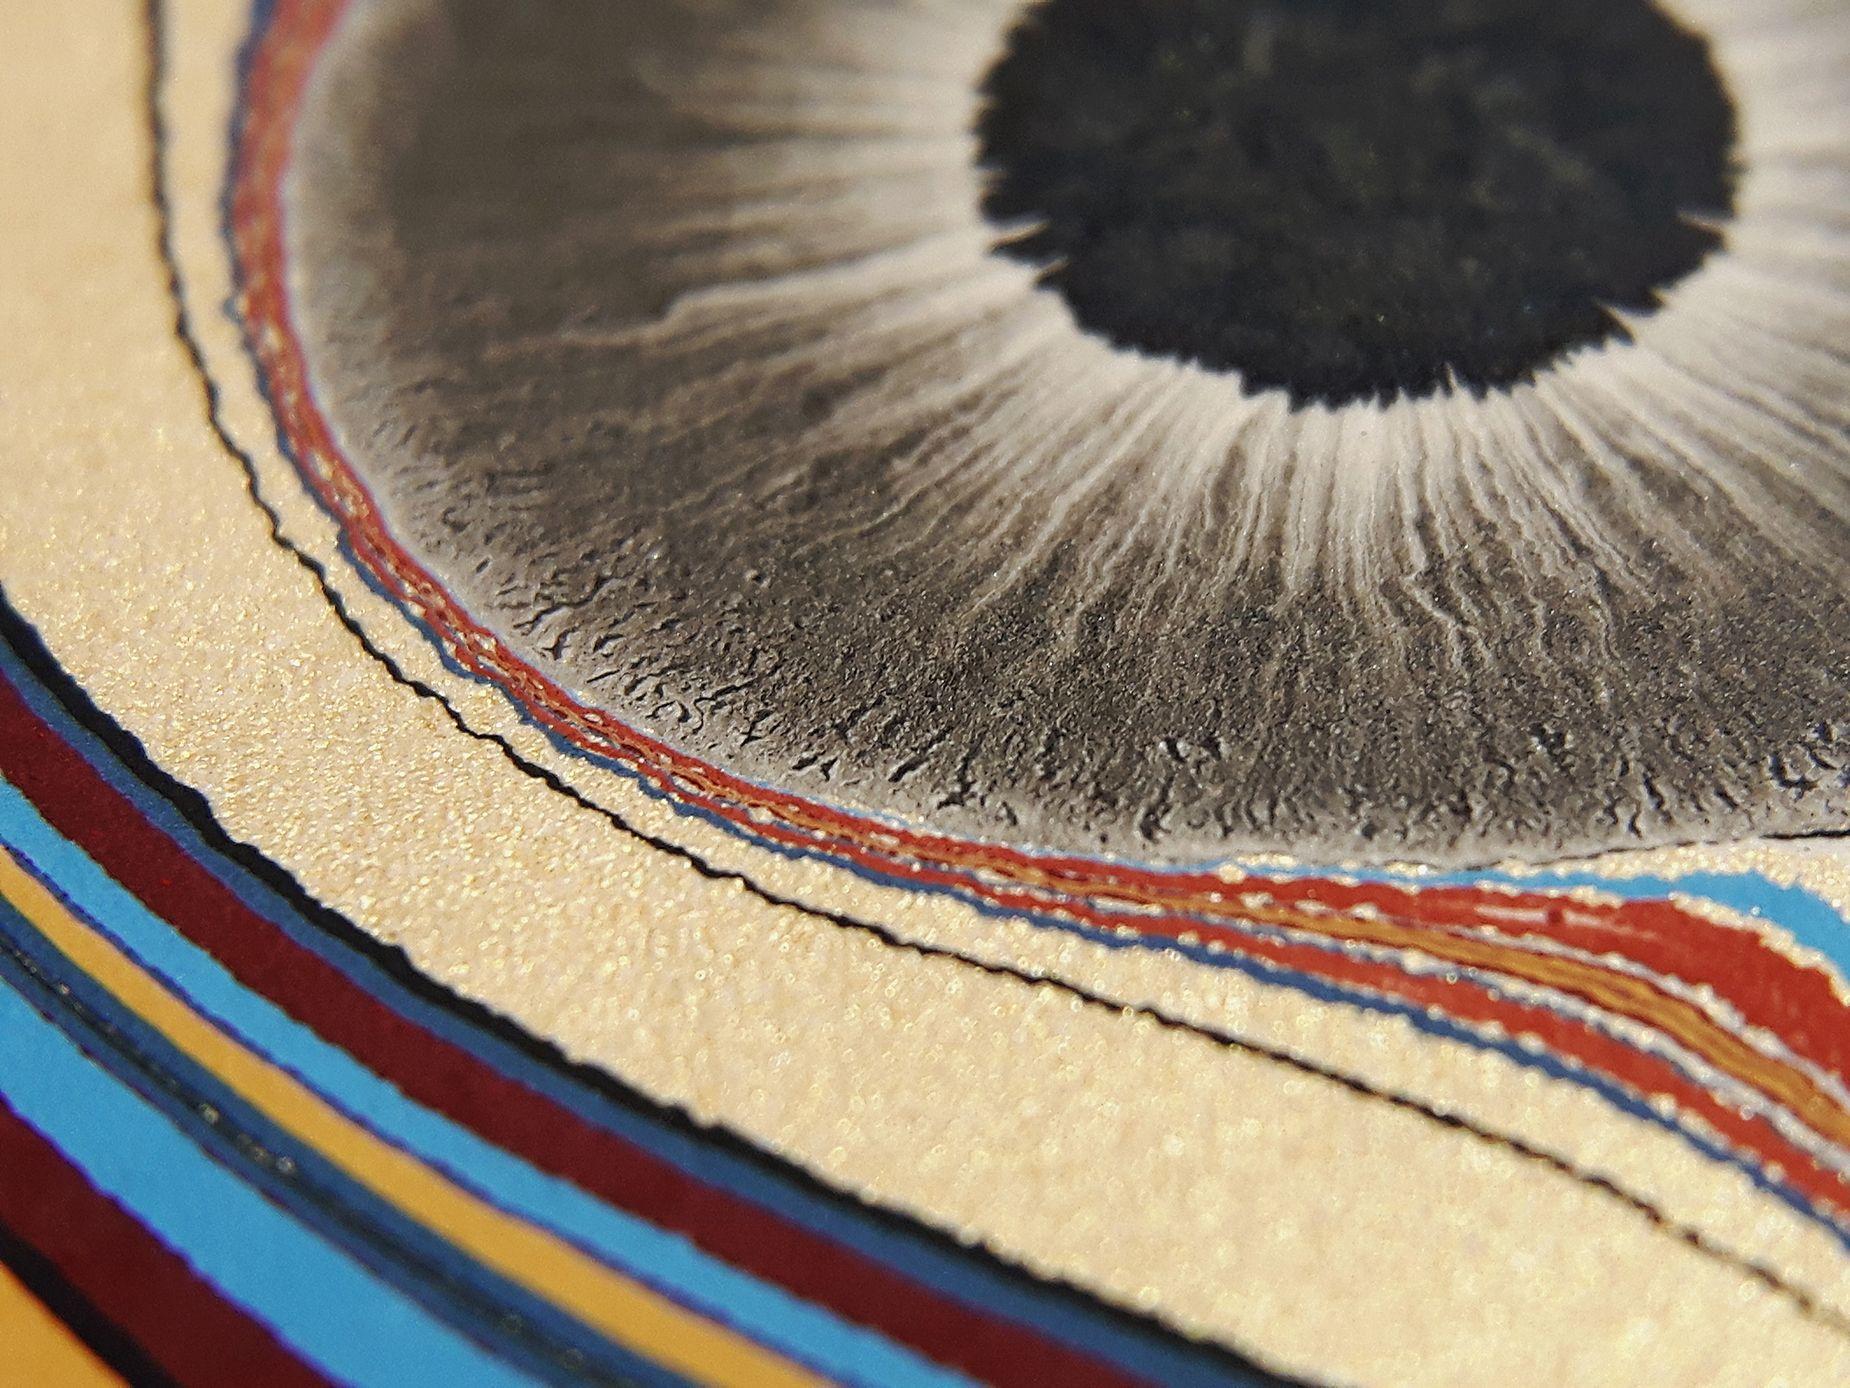 Tiger Eye marbled paper by Renato Crepaldi. #marbledpaper #marbling #renatocrepaldi #bookbinding #marbled #paper #marbled_paper #endpaper #decorative #paper #bookmaking #macro